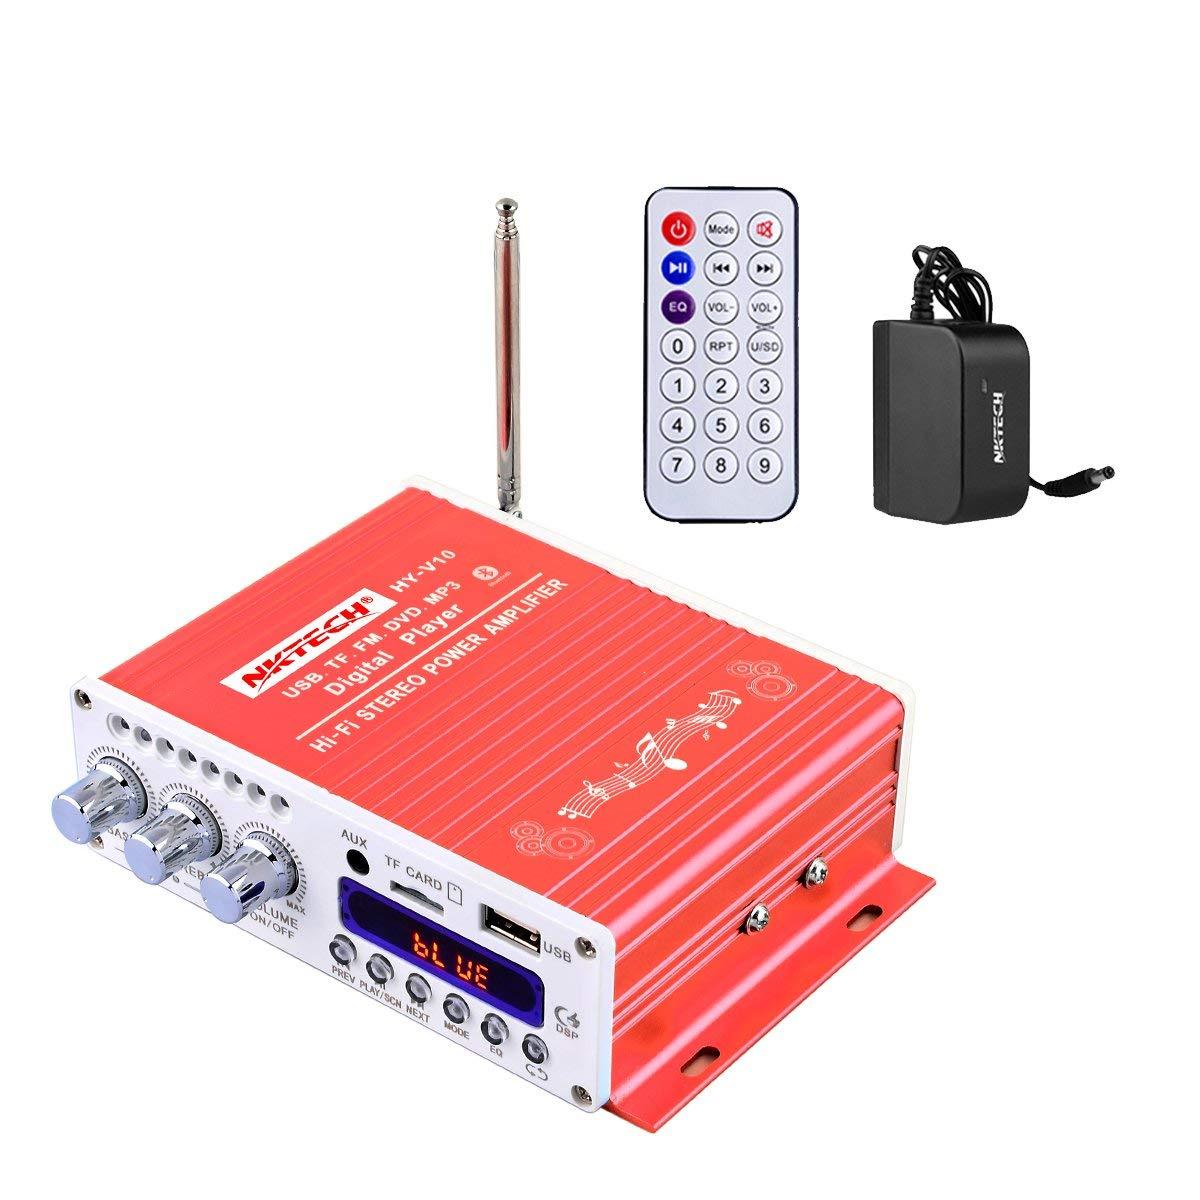 Cheap Car Amplifier Power Supply Design Find Lp2020a Tripath Classt Hifi Audio Mini With Get Quotations Nktech Dc 12v 3a Hy V10 Fm Mp3 Usb